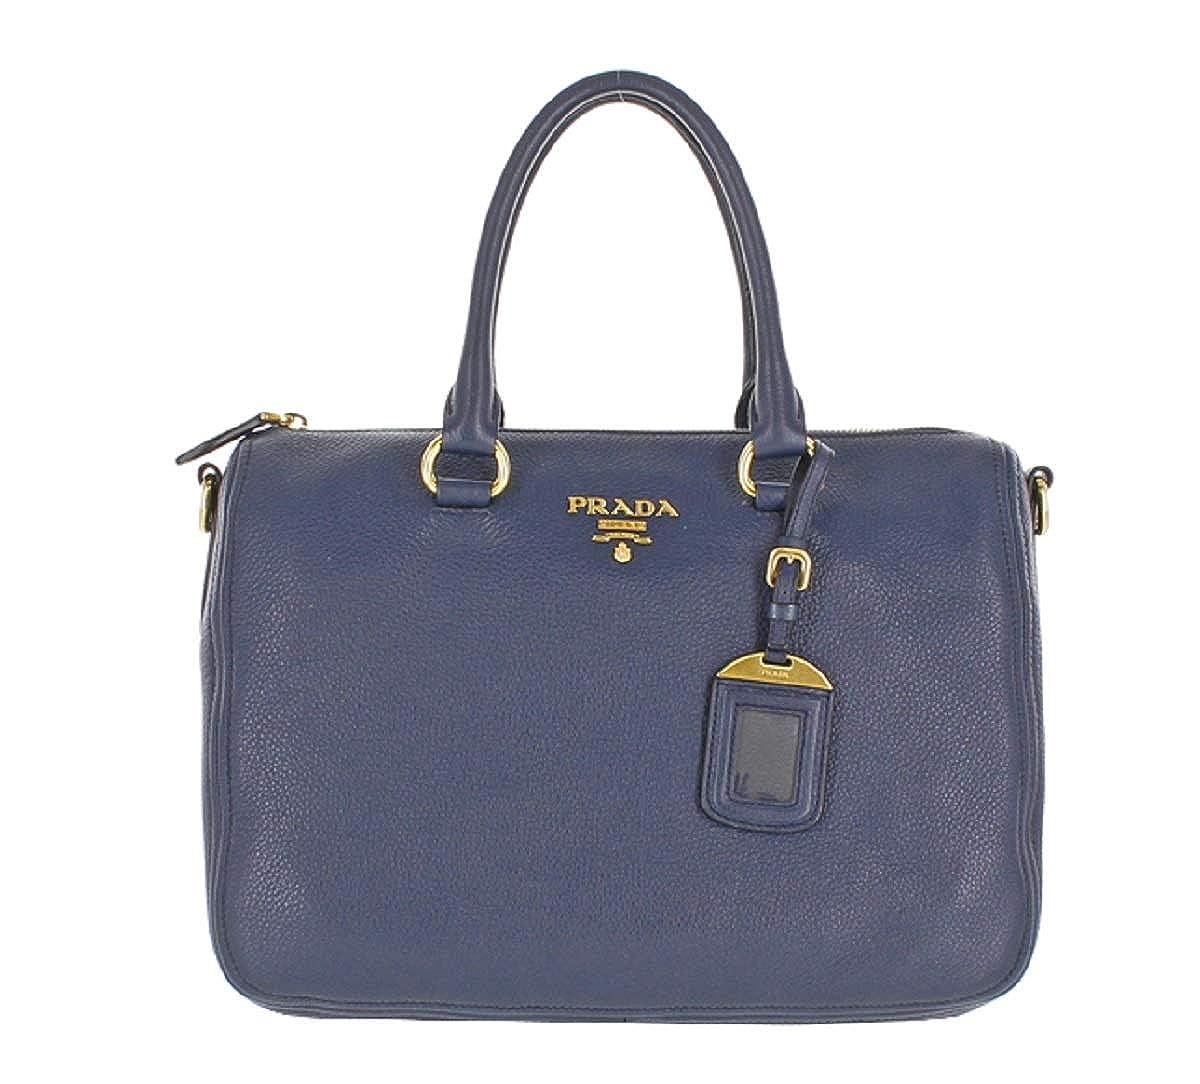 a2d5e663f515 Prada Bauletto Women s Navy Baltico Vitello Phenix Handbag 1BB023  Handbags   Amazon.com